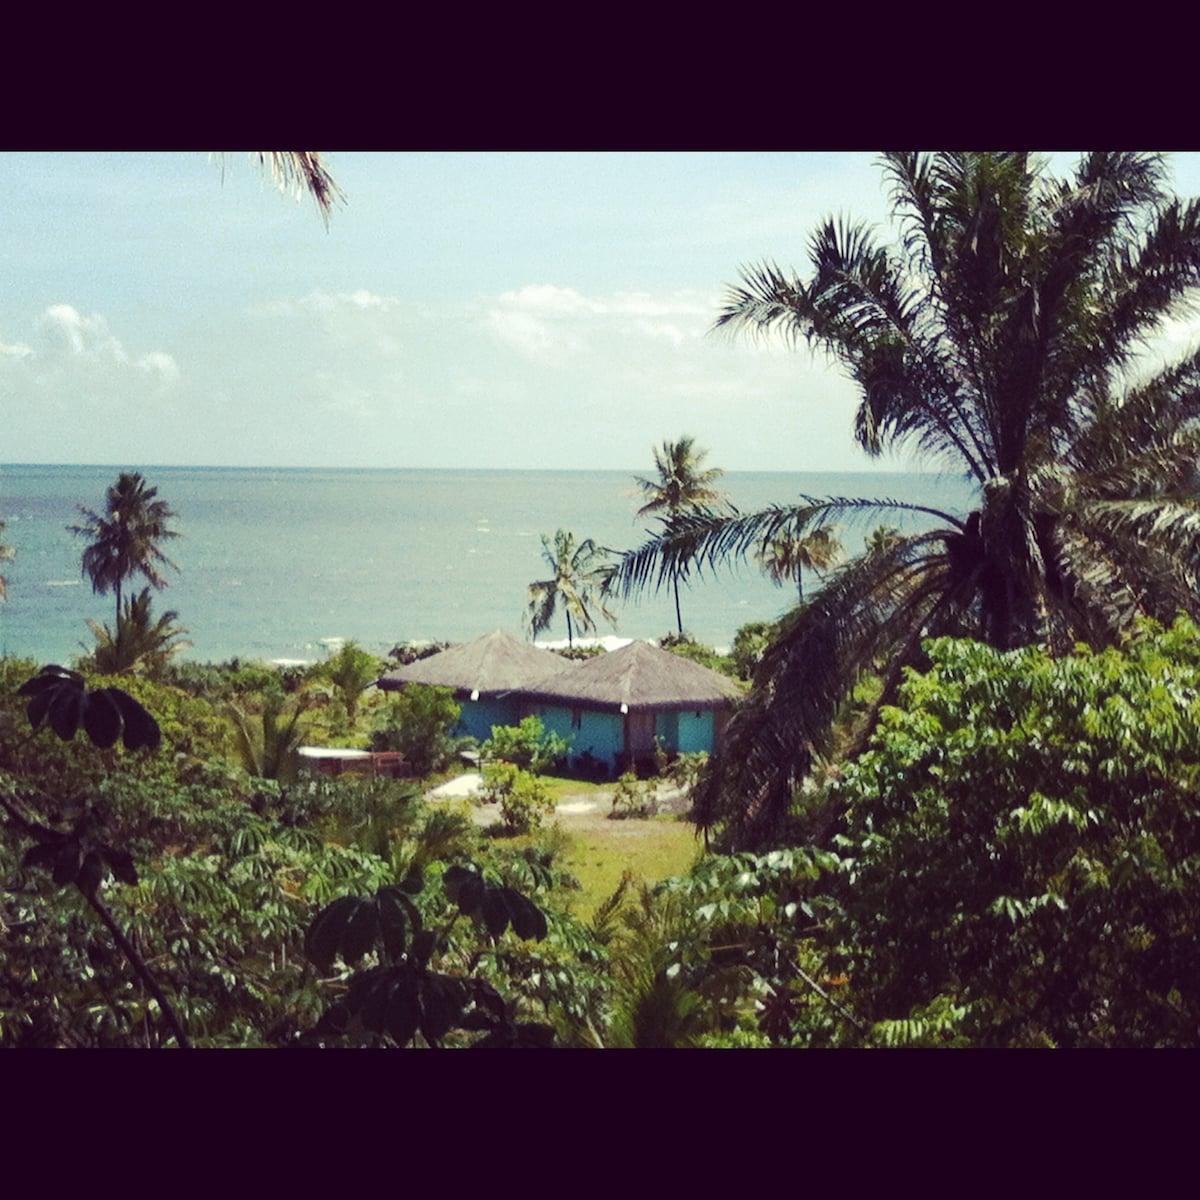 Our beach house at Ponta do Muta